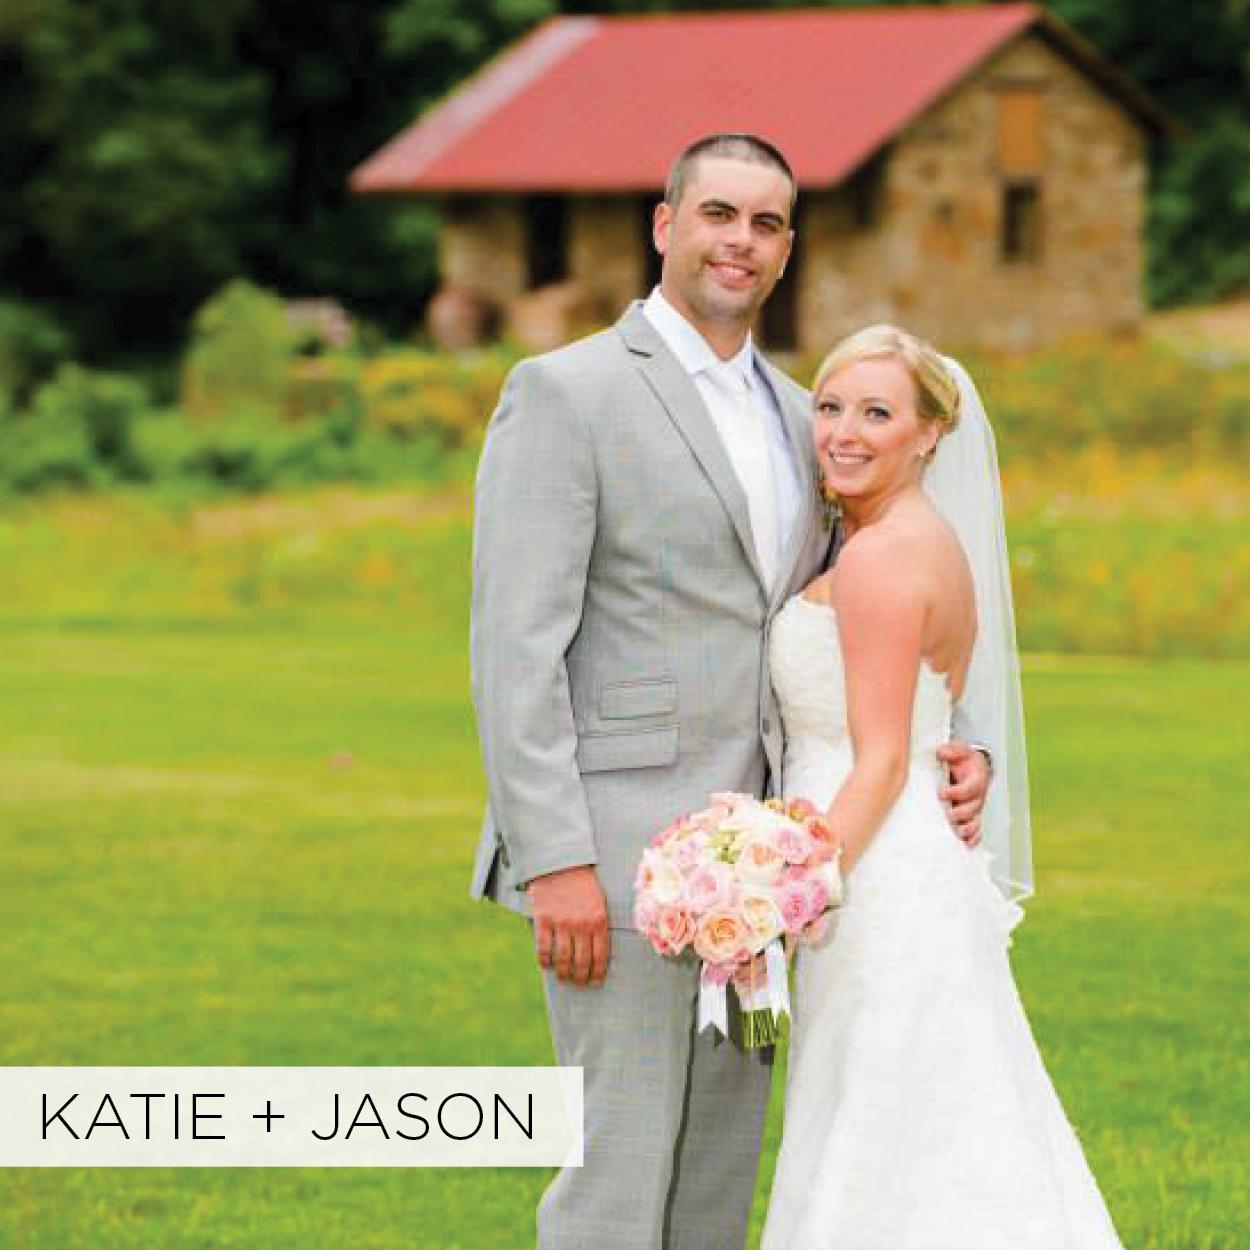 Katie-Jason.jpg